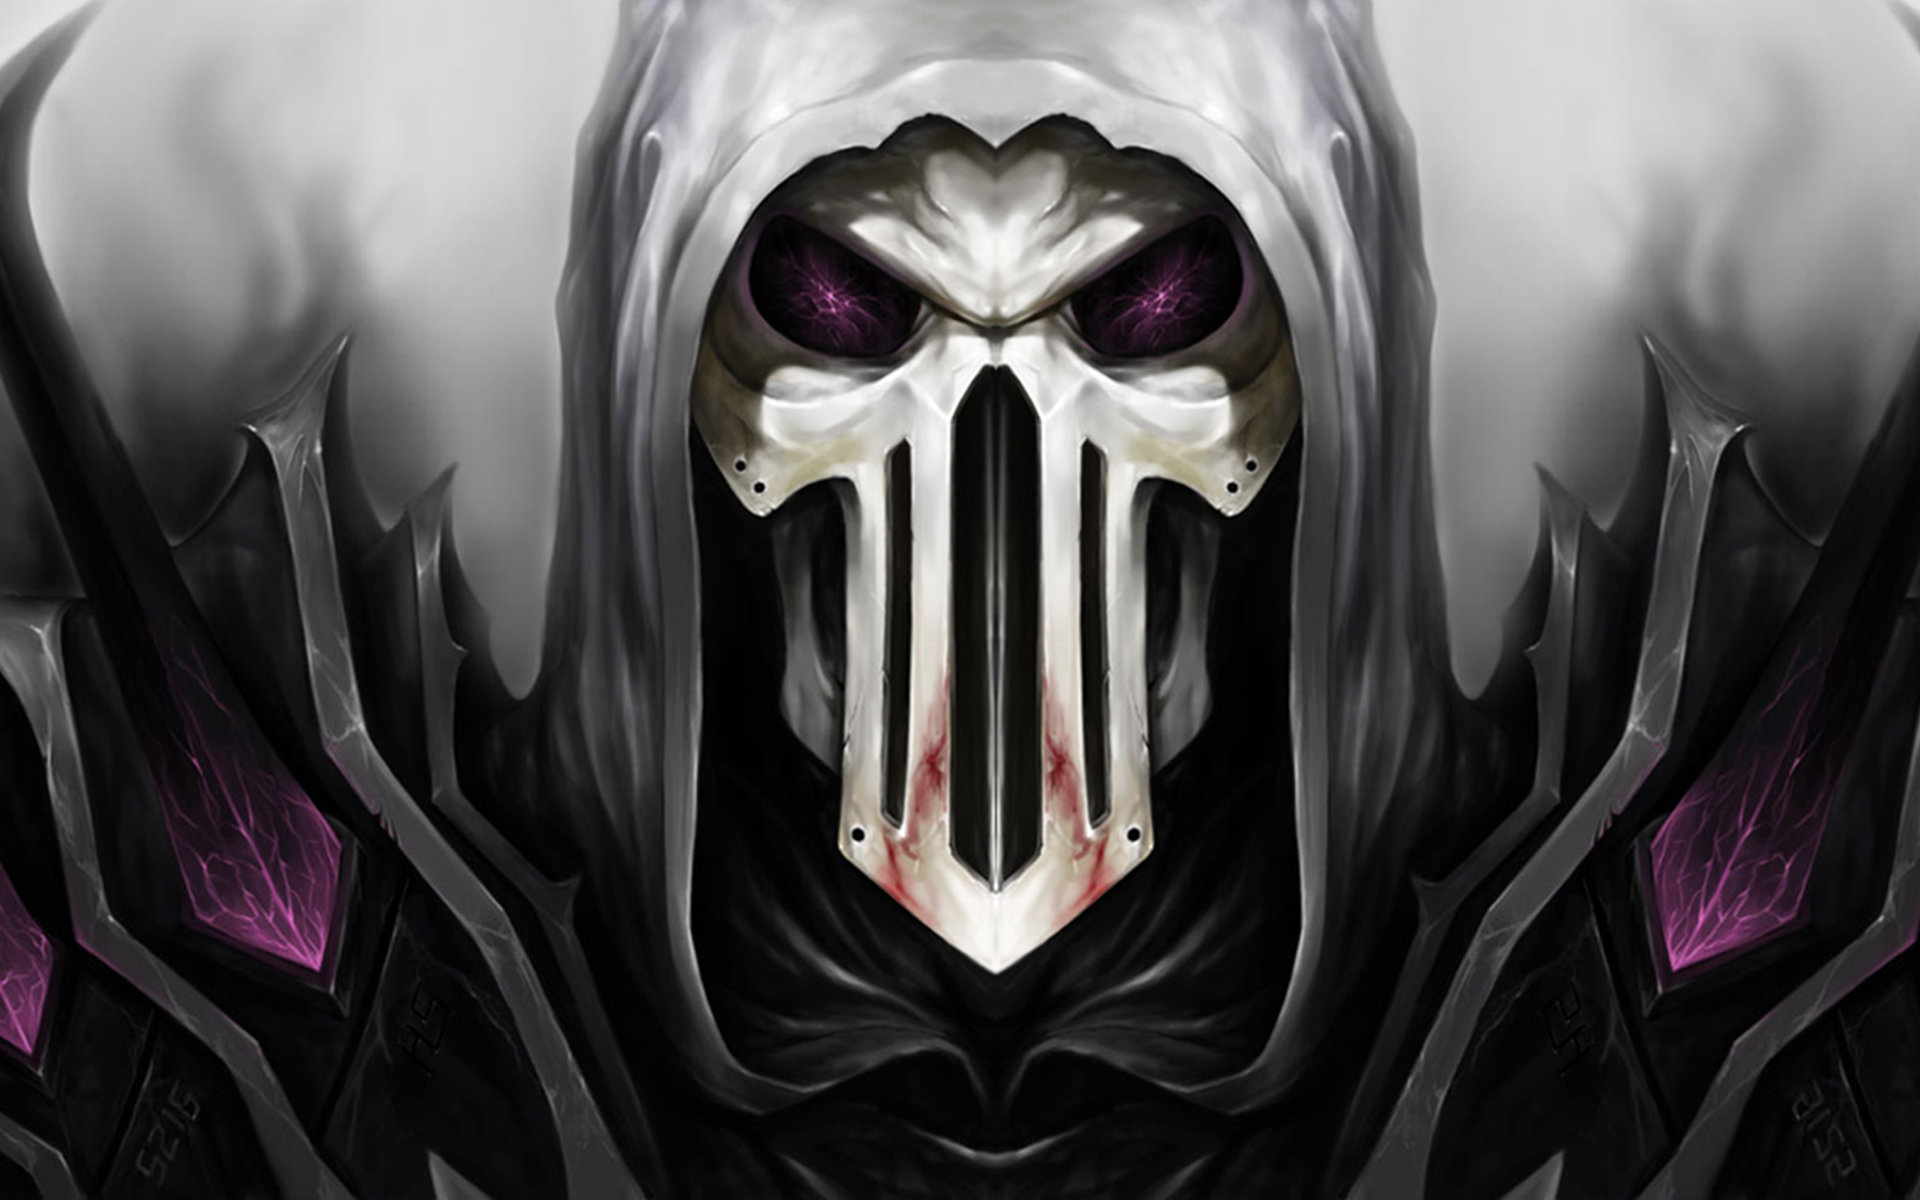 Best Darksiders 2 Ii Wallpaper Id466232 For High